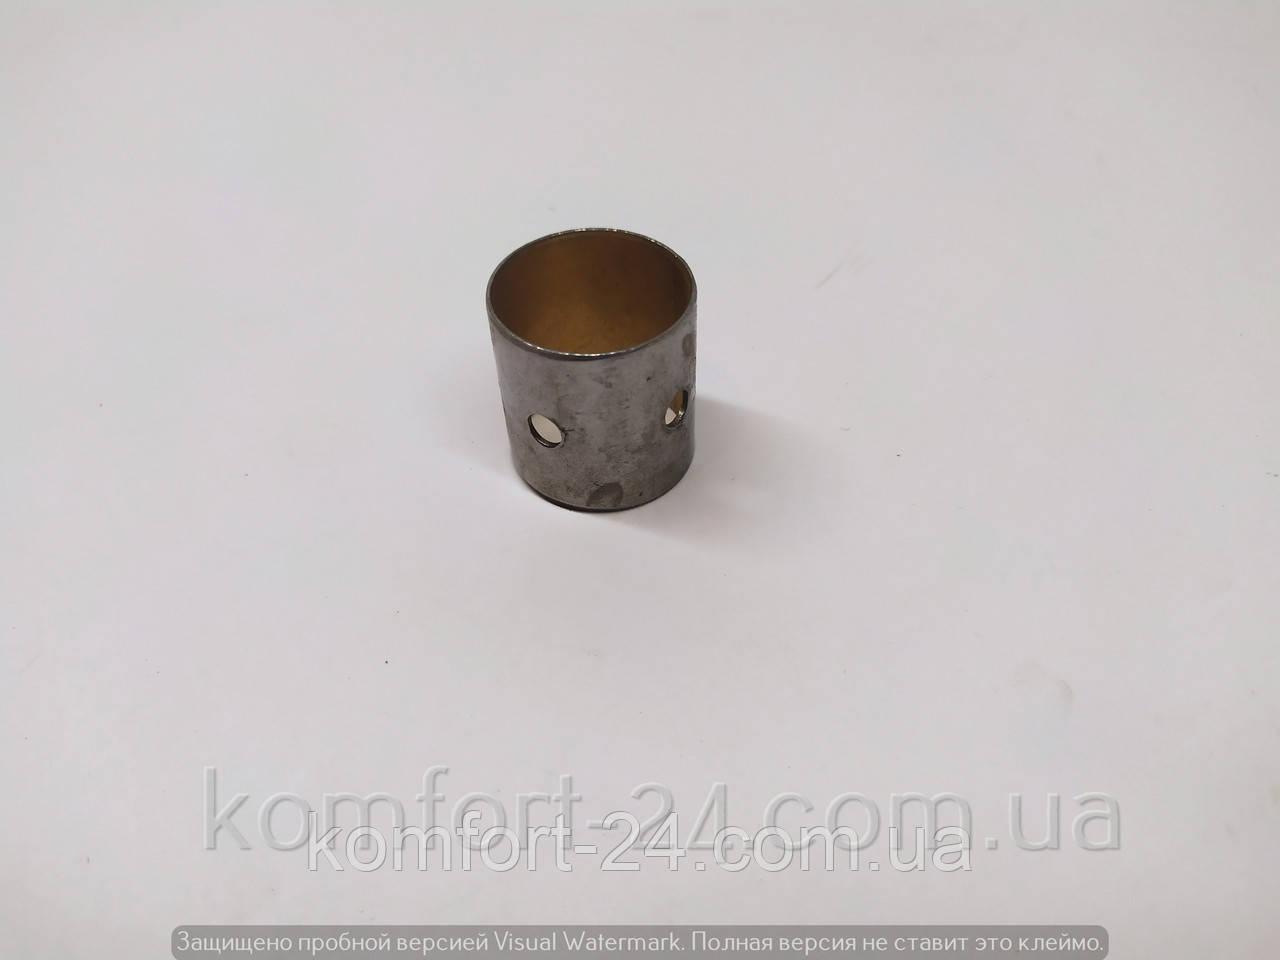 Втулка шатуна малая HT-135 186F 9 HP